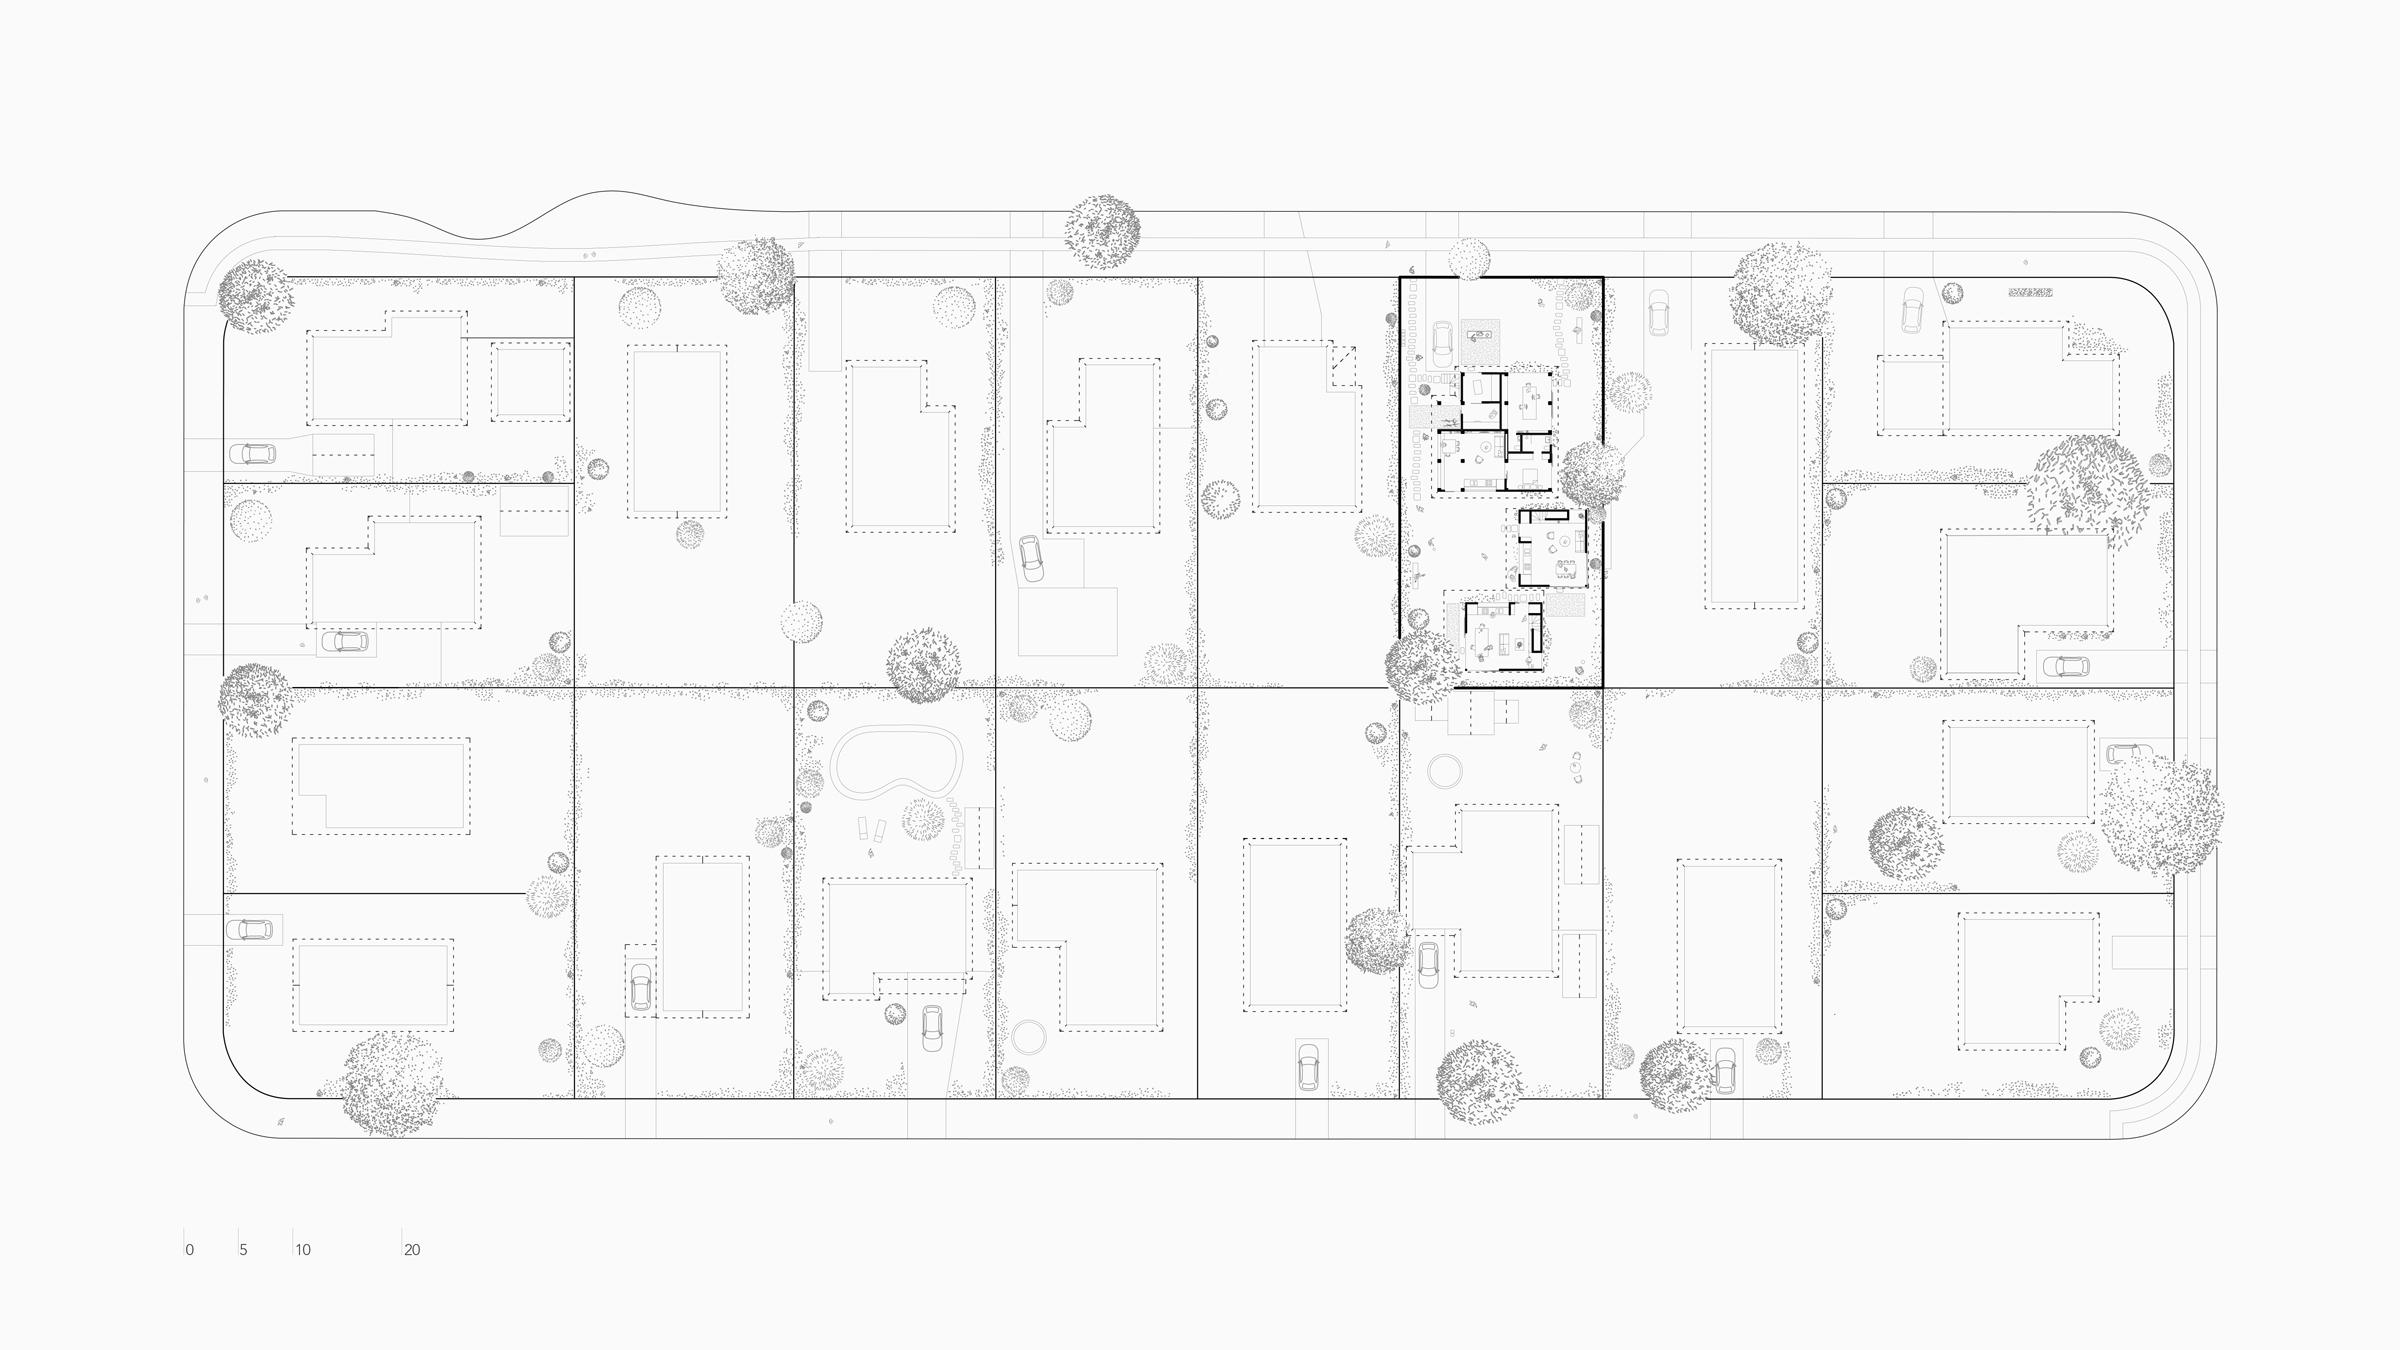 171212-Dappled-Dwellings-Site-Plan-Stage-01.jpg